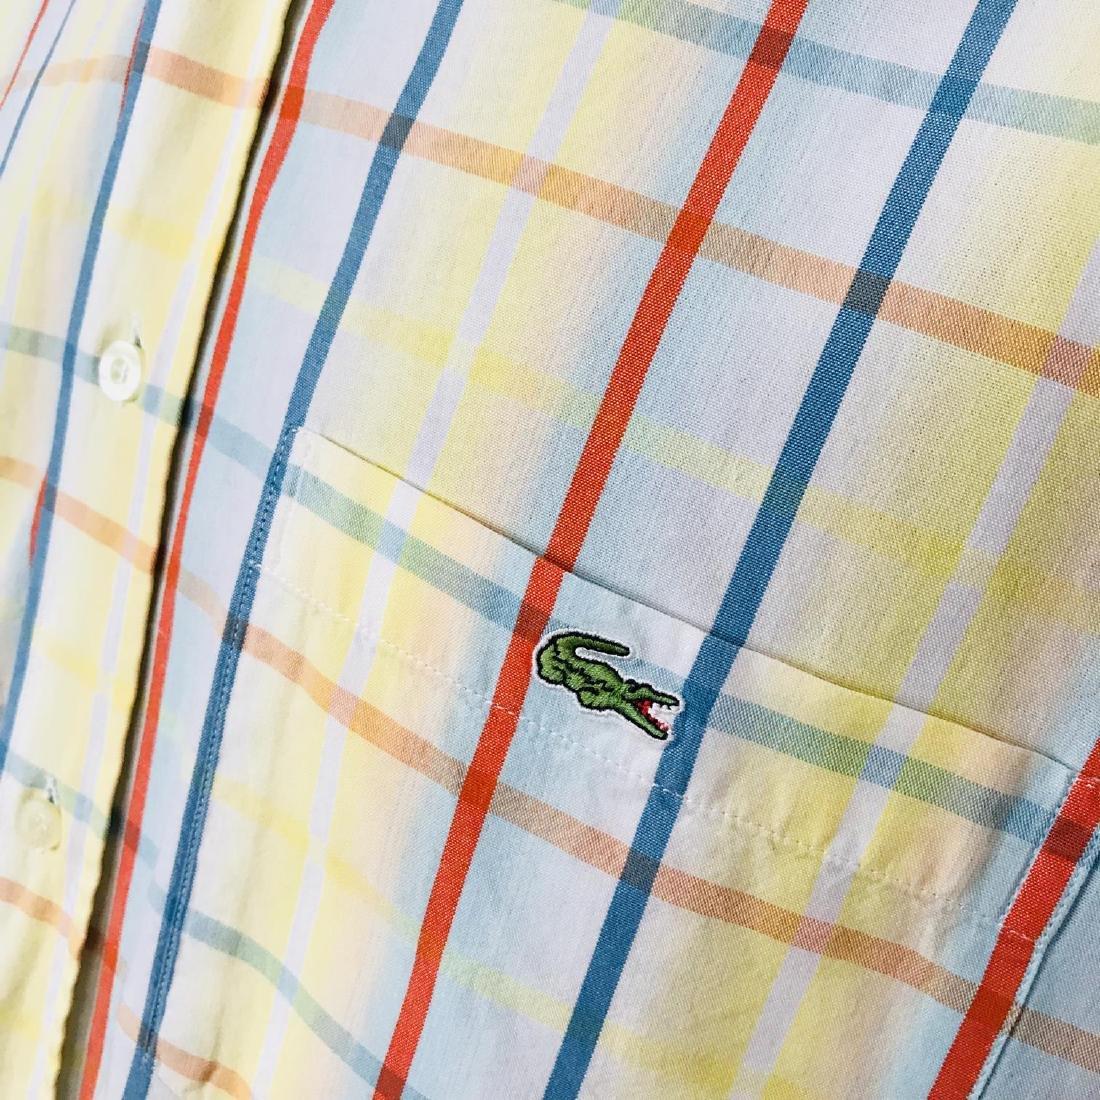 Men's Lacoste Short Sleeve Shirt Top Size US 41 Large - 3